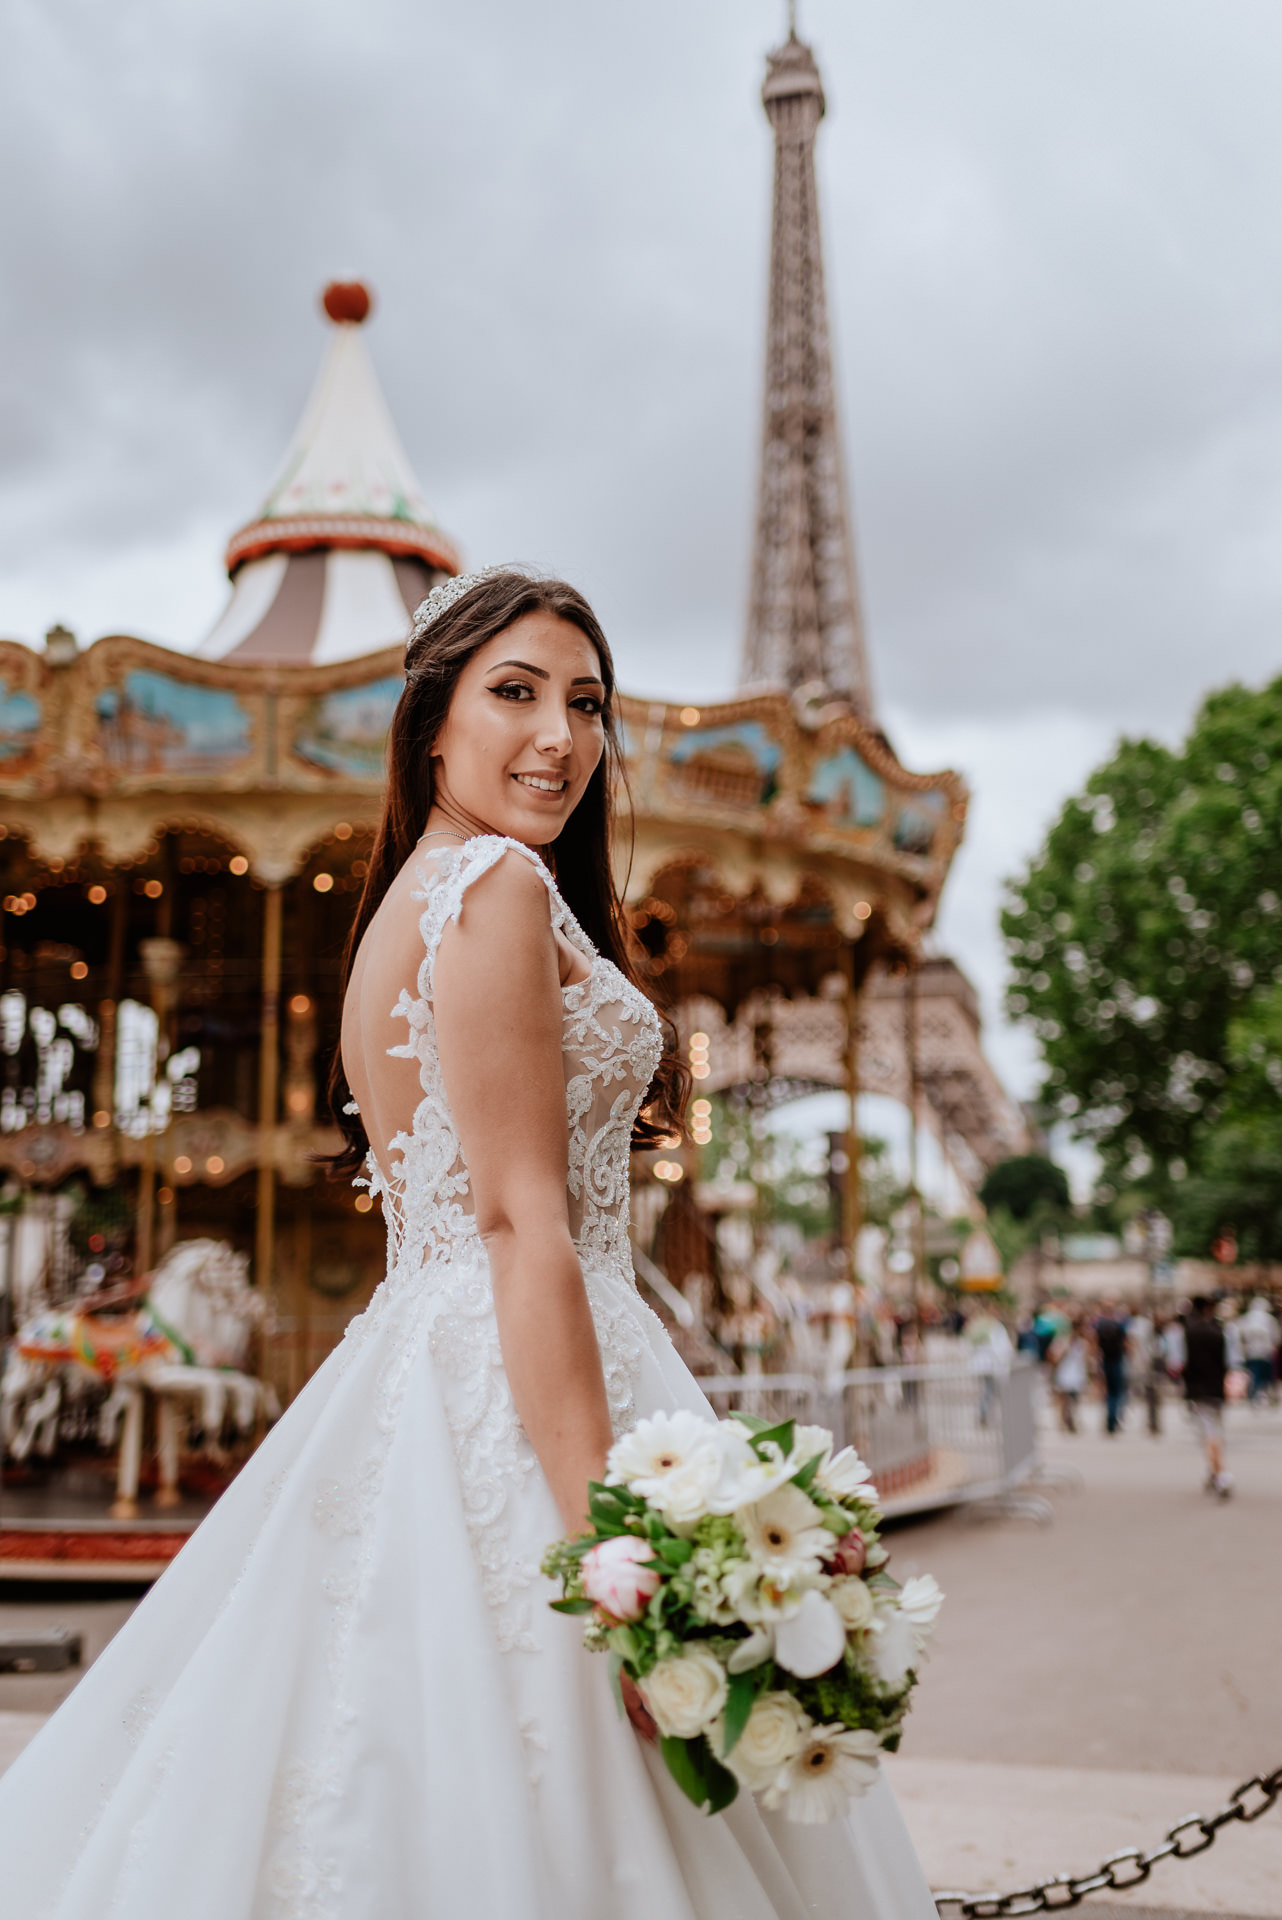 PAris wedding dress designers